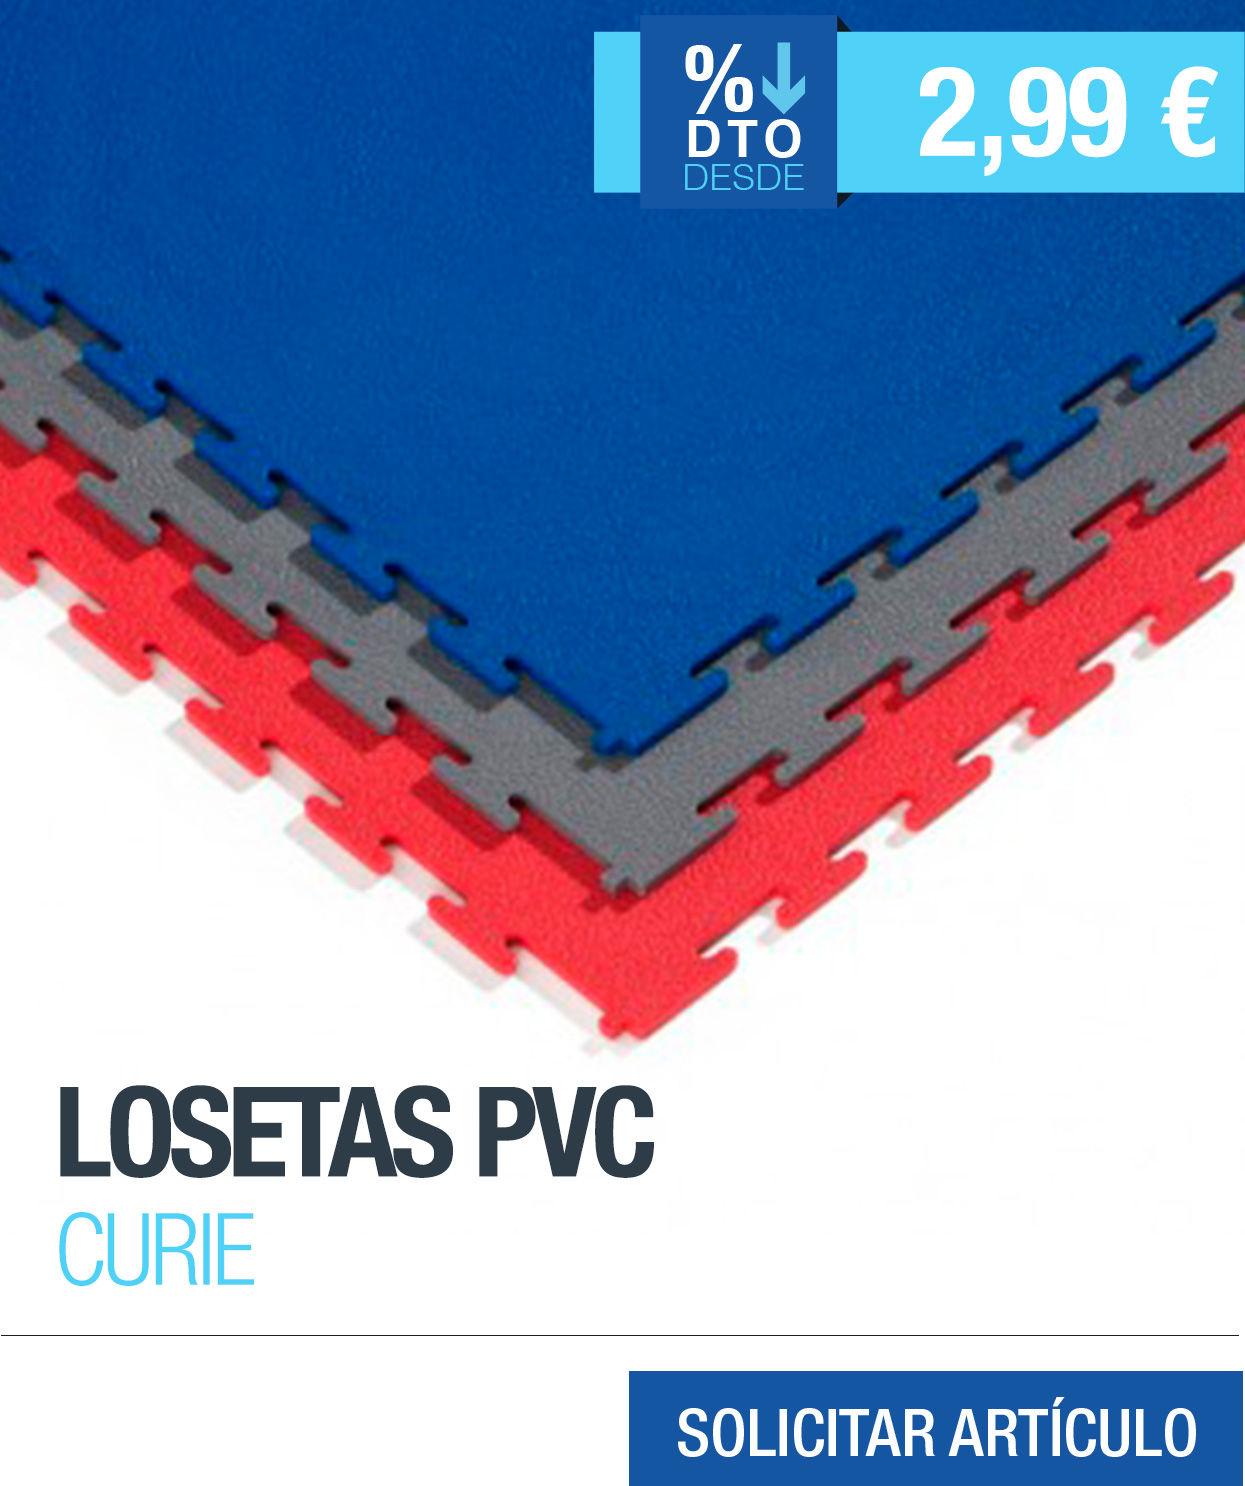 Losetas de PVC CURIE